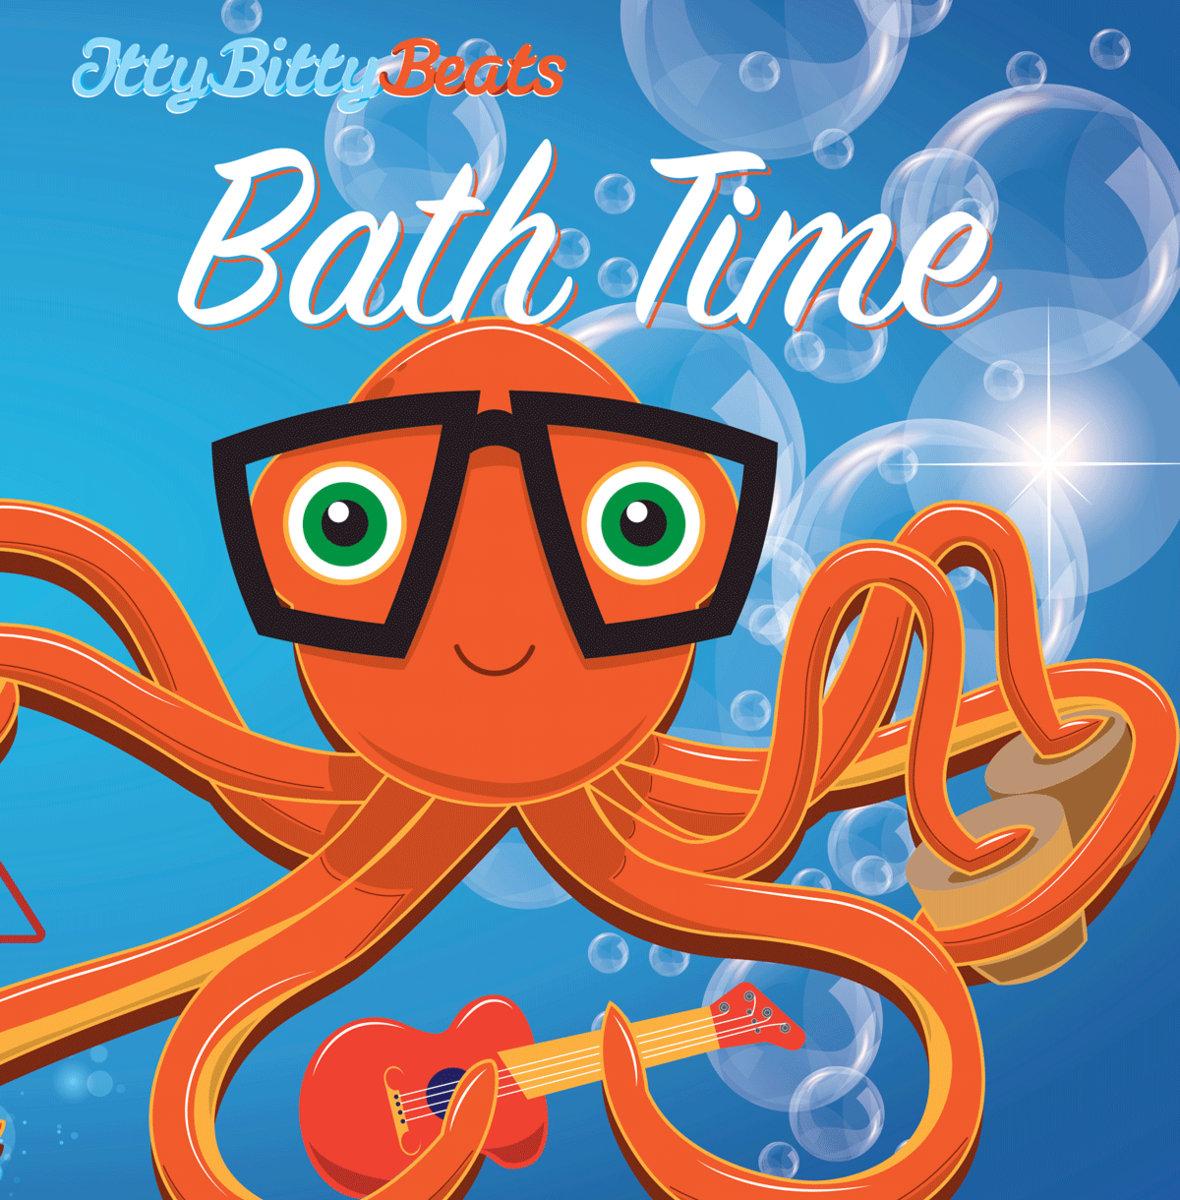 Bathtime-Cover-Art.JPG